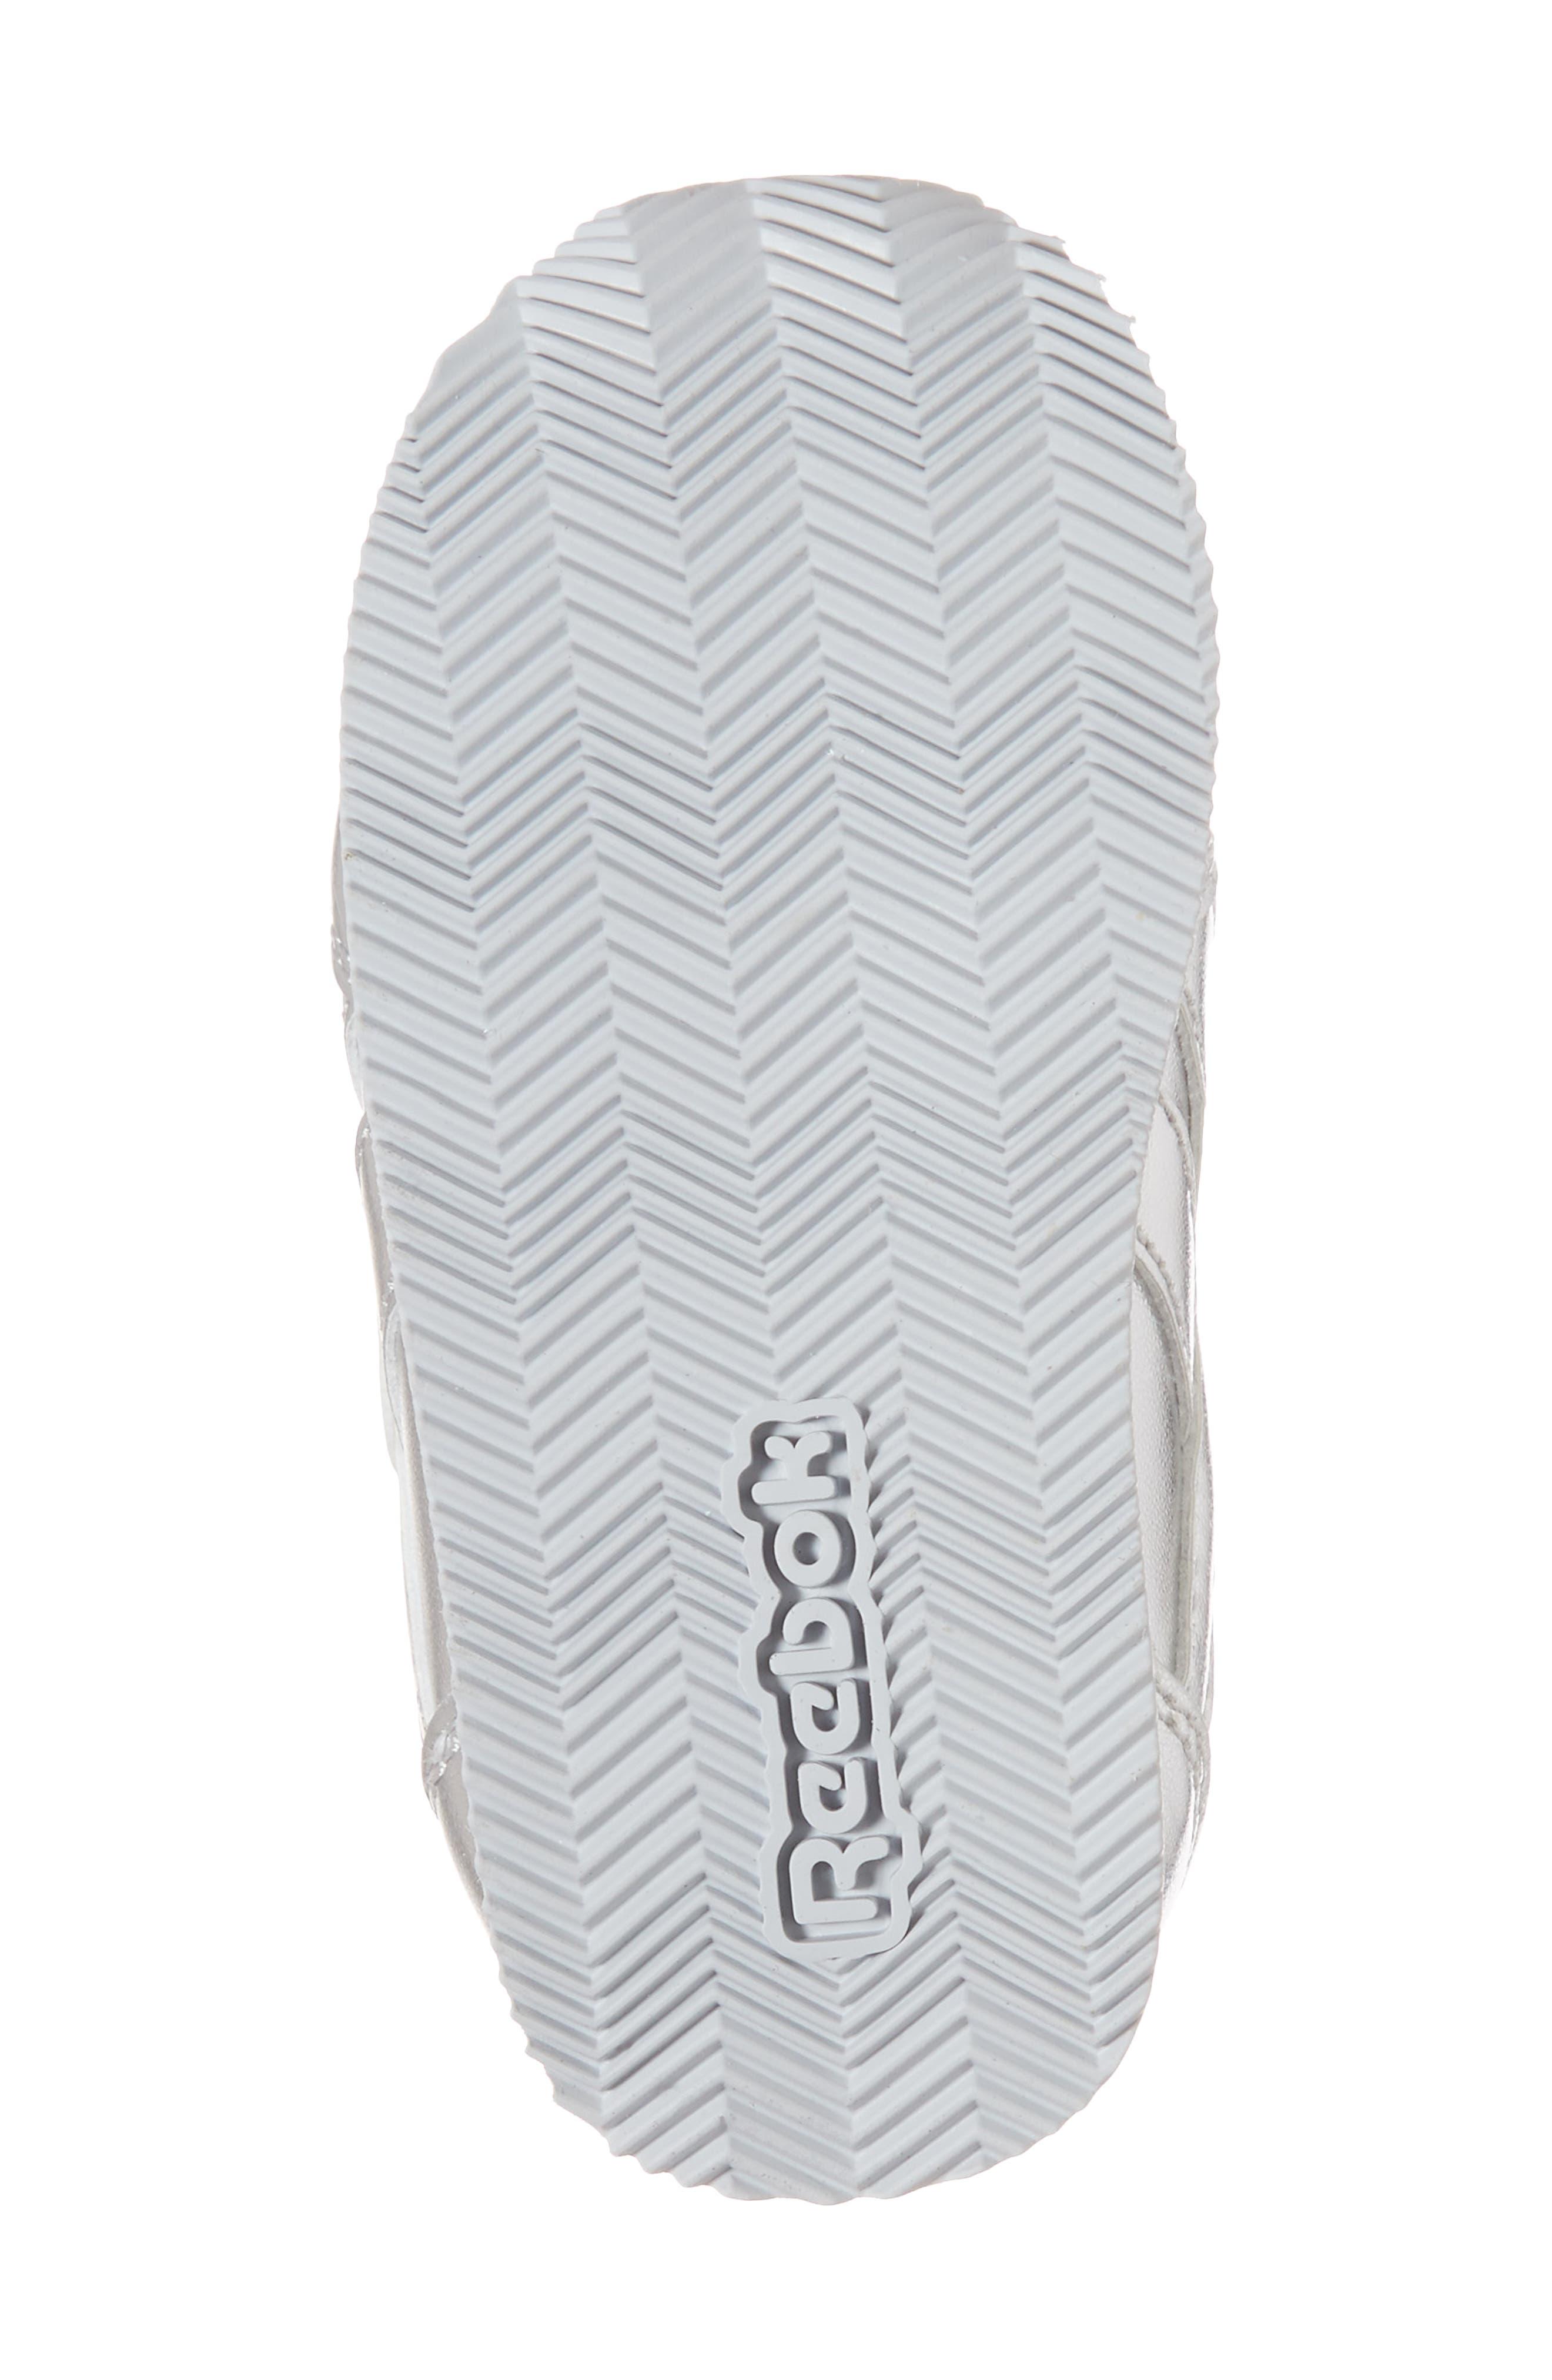 Royal Classic Jogger 2 Sneaker,                             Alternate thumbnail 6, color,                             040